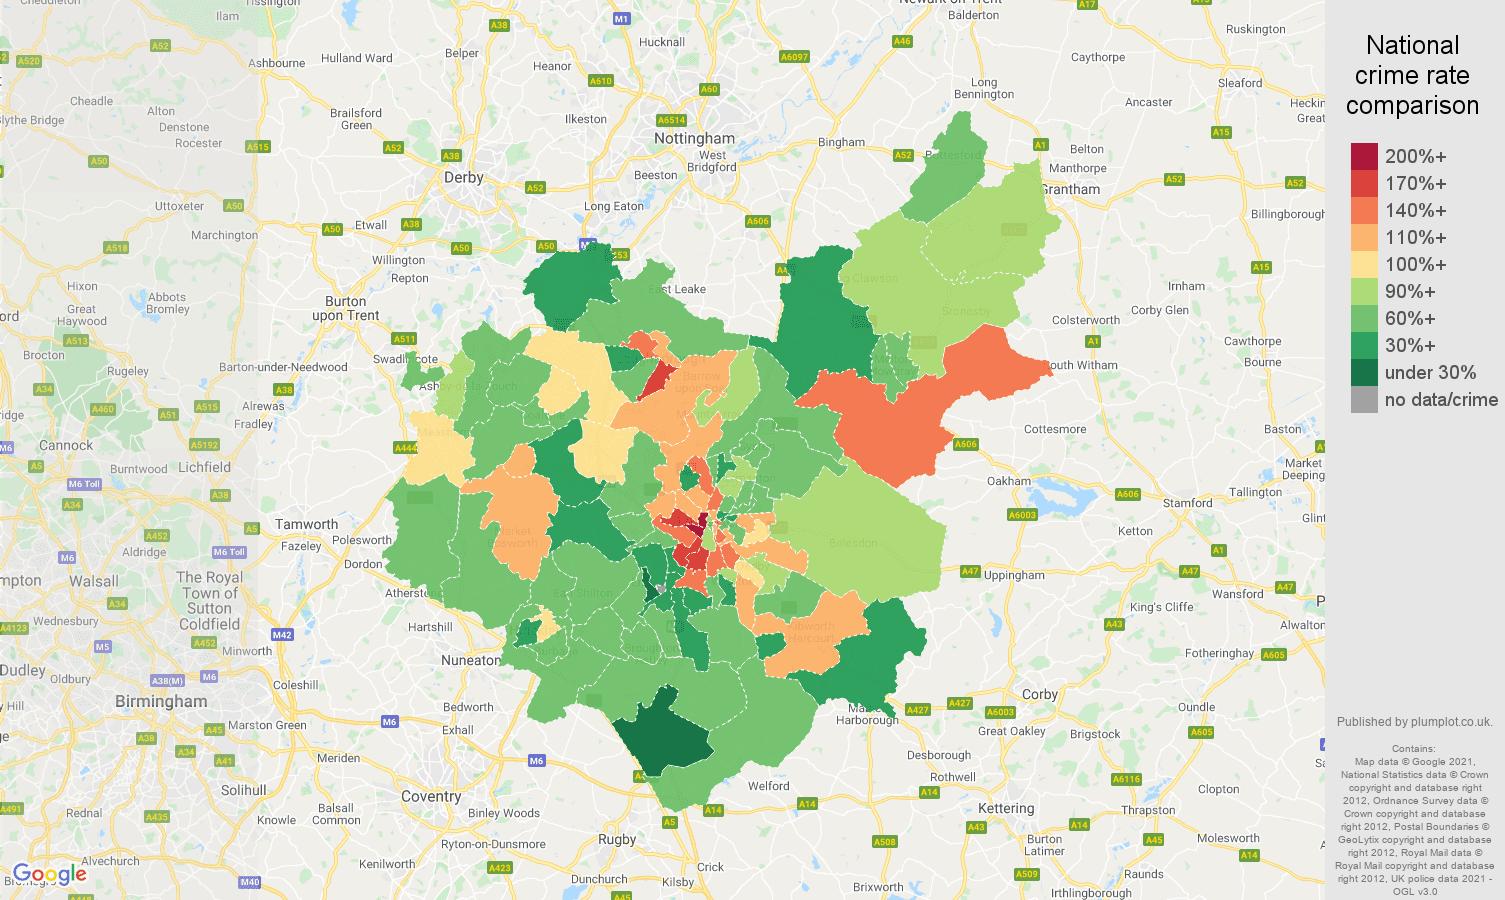 Leicestershire burglary crime rate comparison map